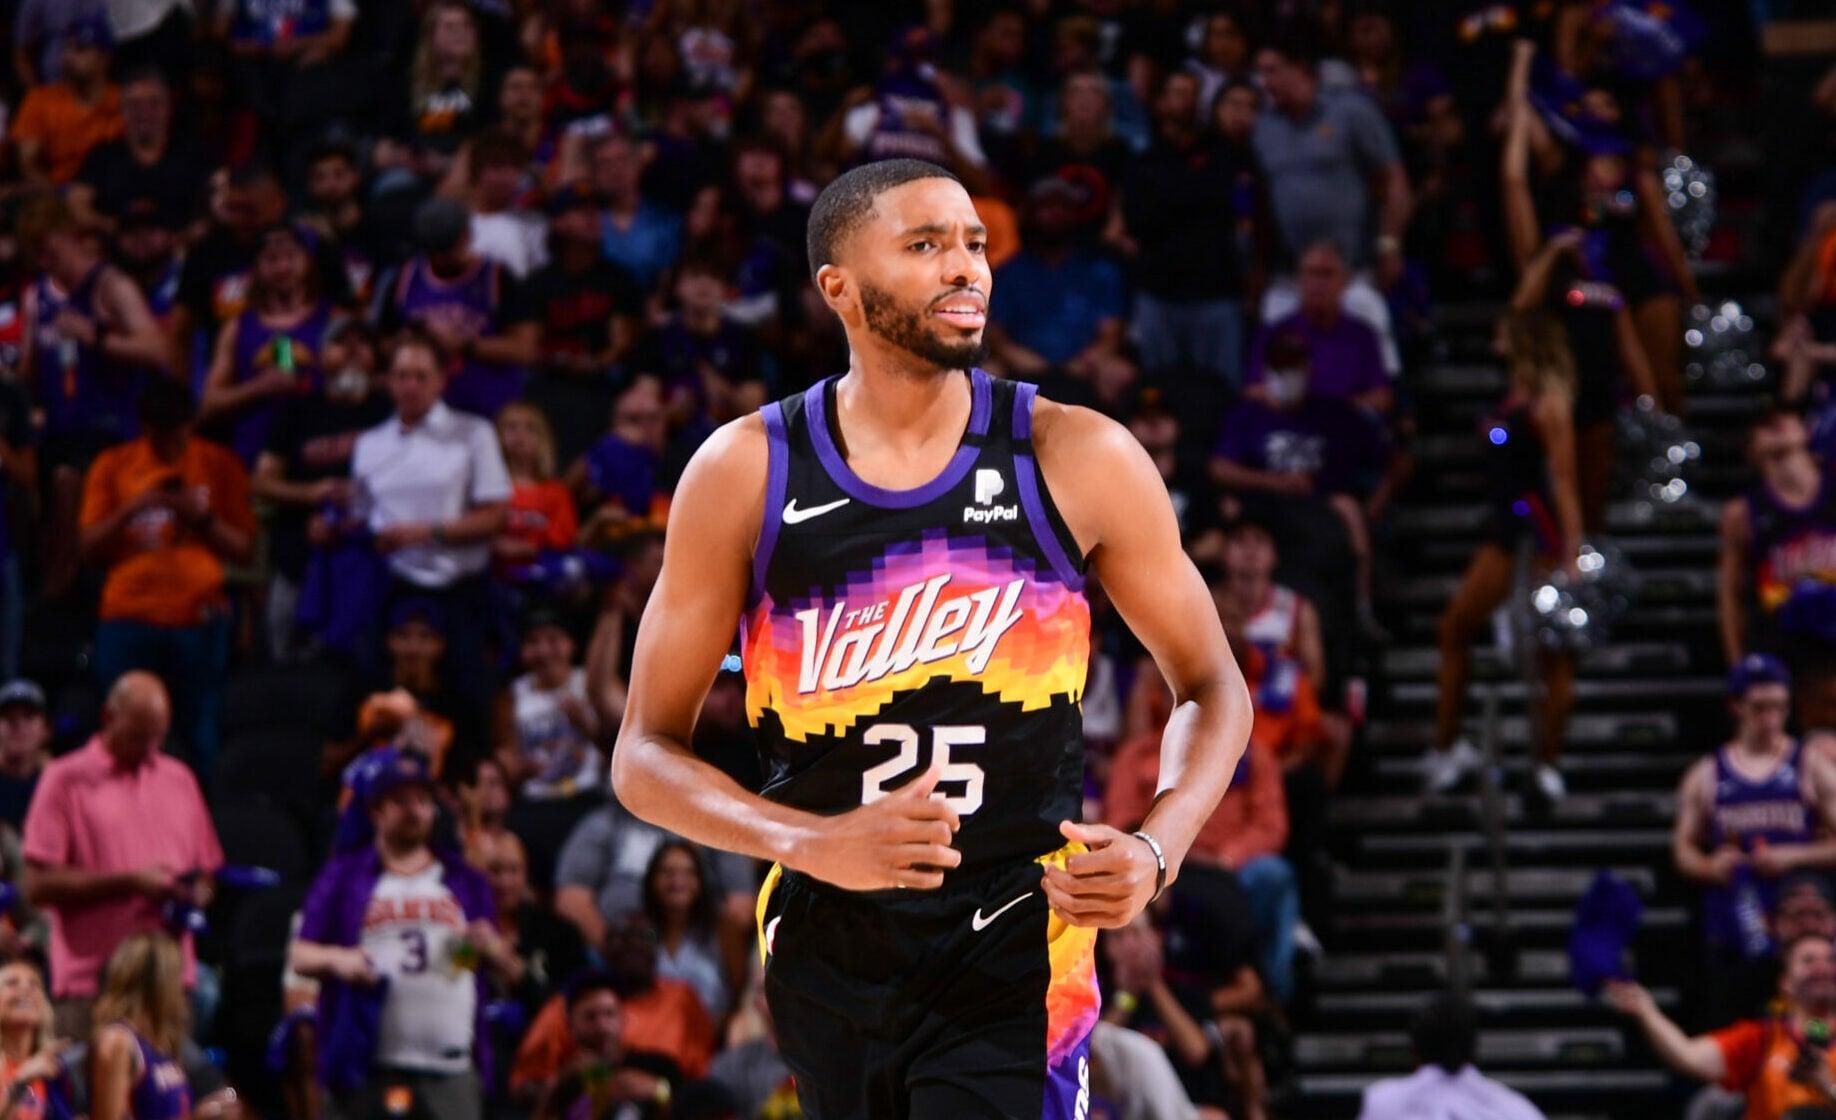 Report: Mikal Bridges, Phoenix Suns agree to 4-year, $90 million extension